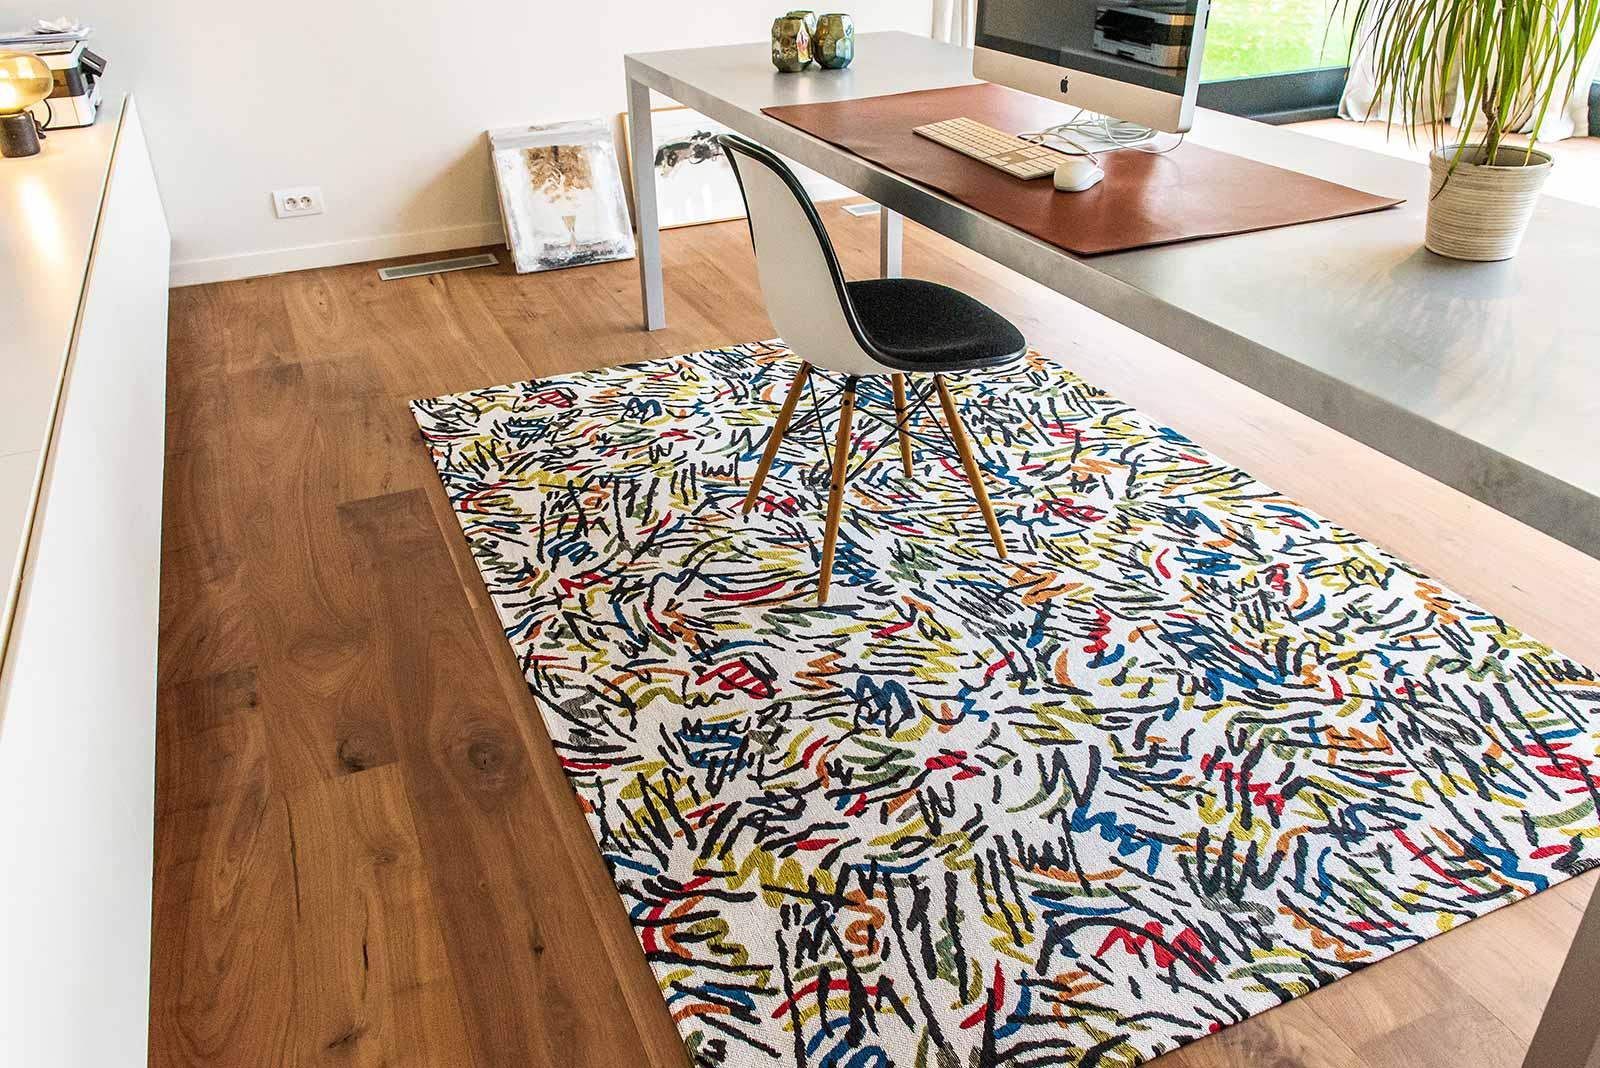 Louis De Poortere rug CS 9144 Gallery Graffito Street Graph interior 4